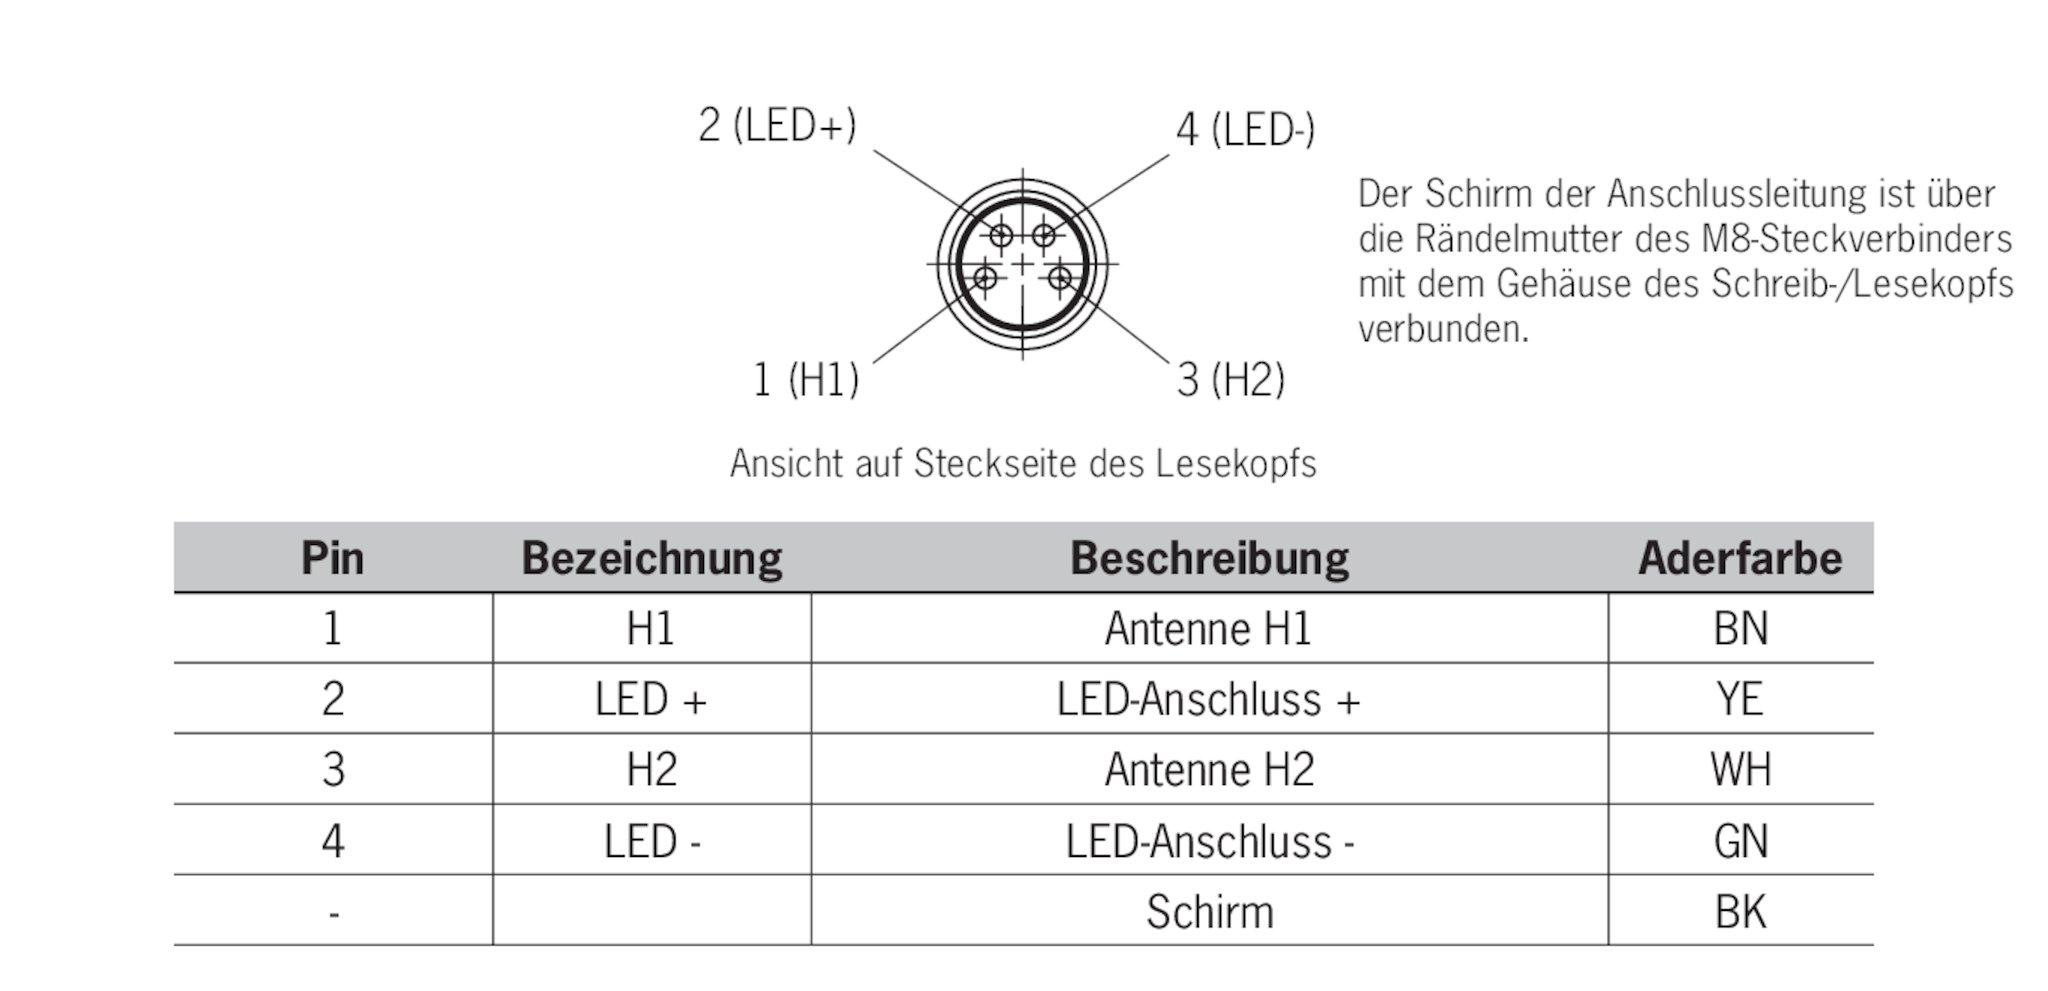 hyundai entourage headlight switch wiring diagram 21764 m12 connector wiring diagram wiring resources  21764 m12 connector wiring diagram